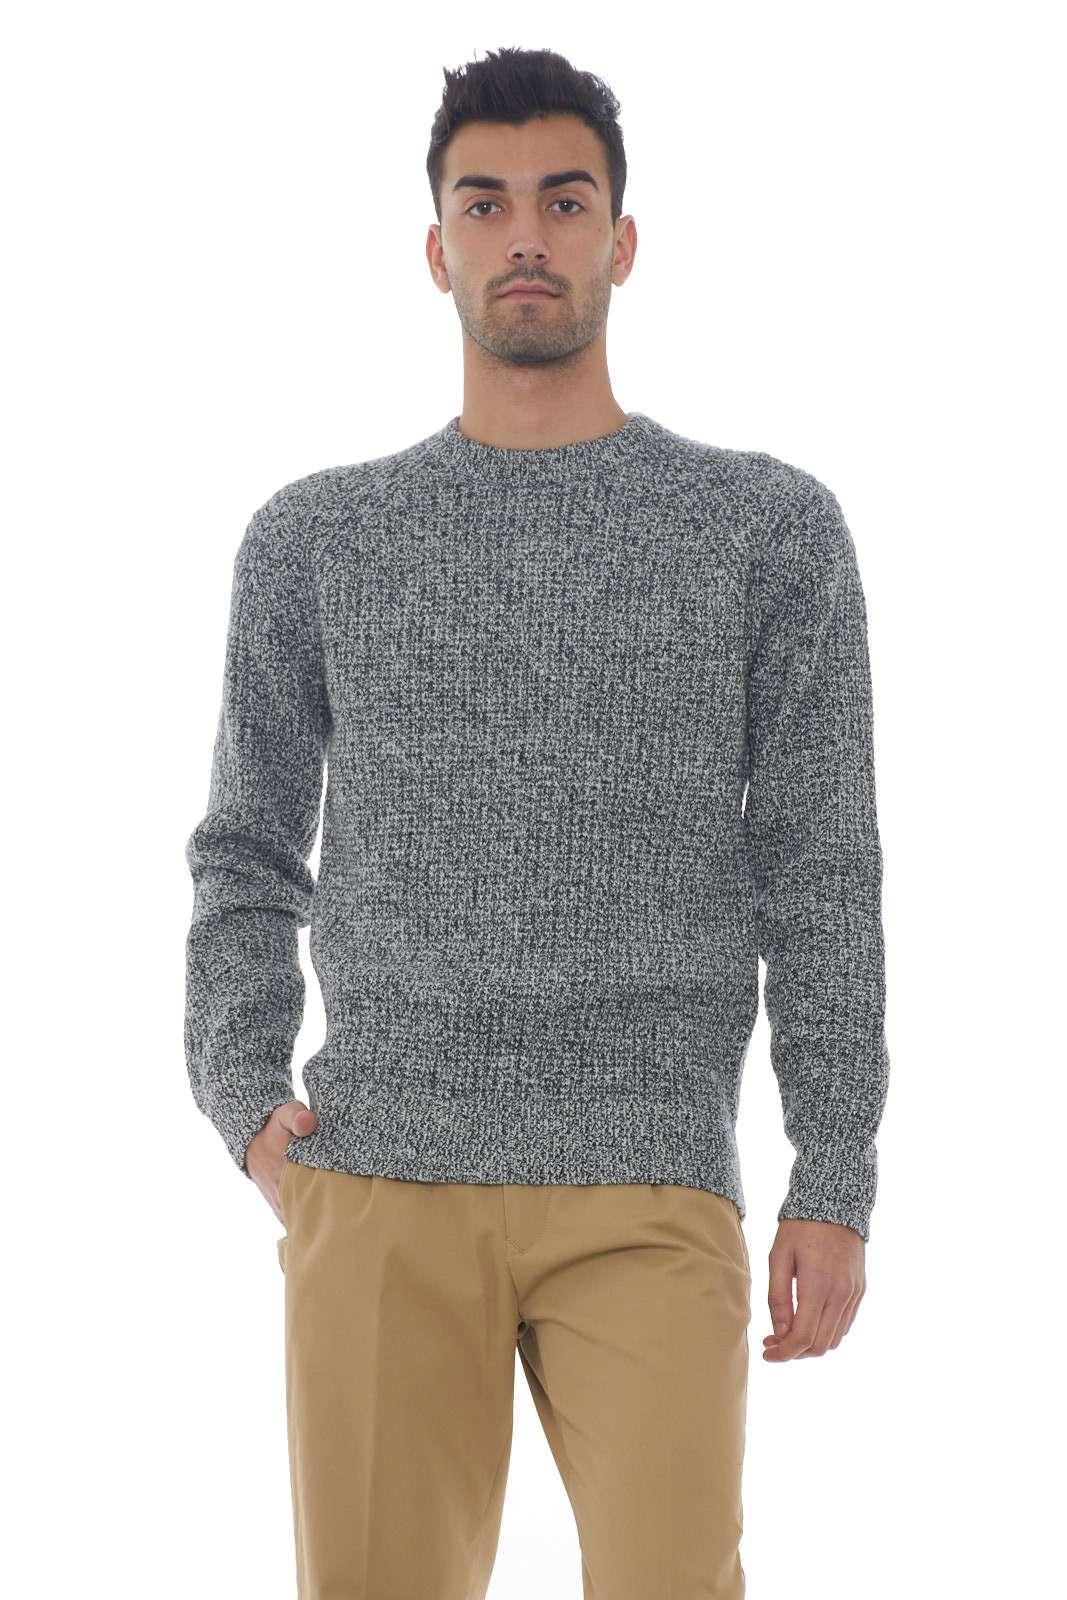 https://www.parmax.com/media/catalog/product/a/i/AI-outlet_parmax-maglia-uomo-Calvin-Klein-K10K104582-A.jpg